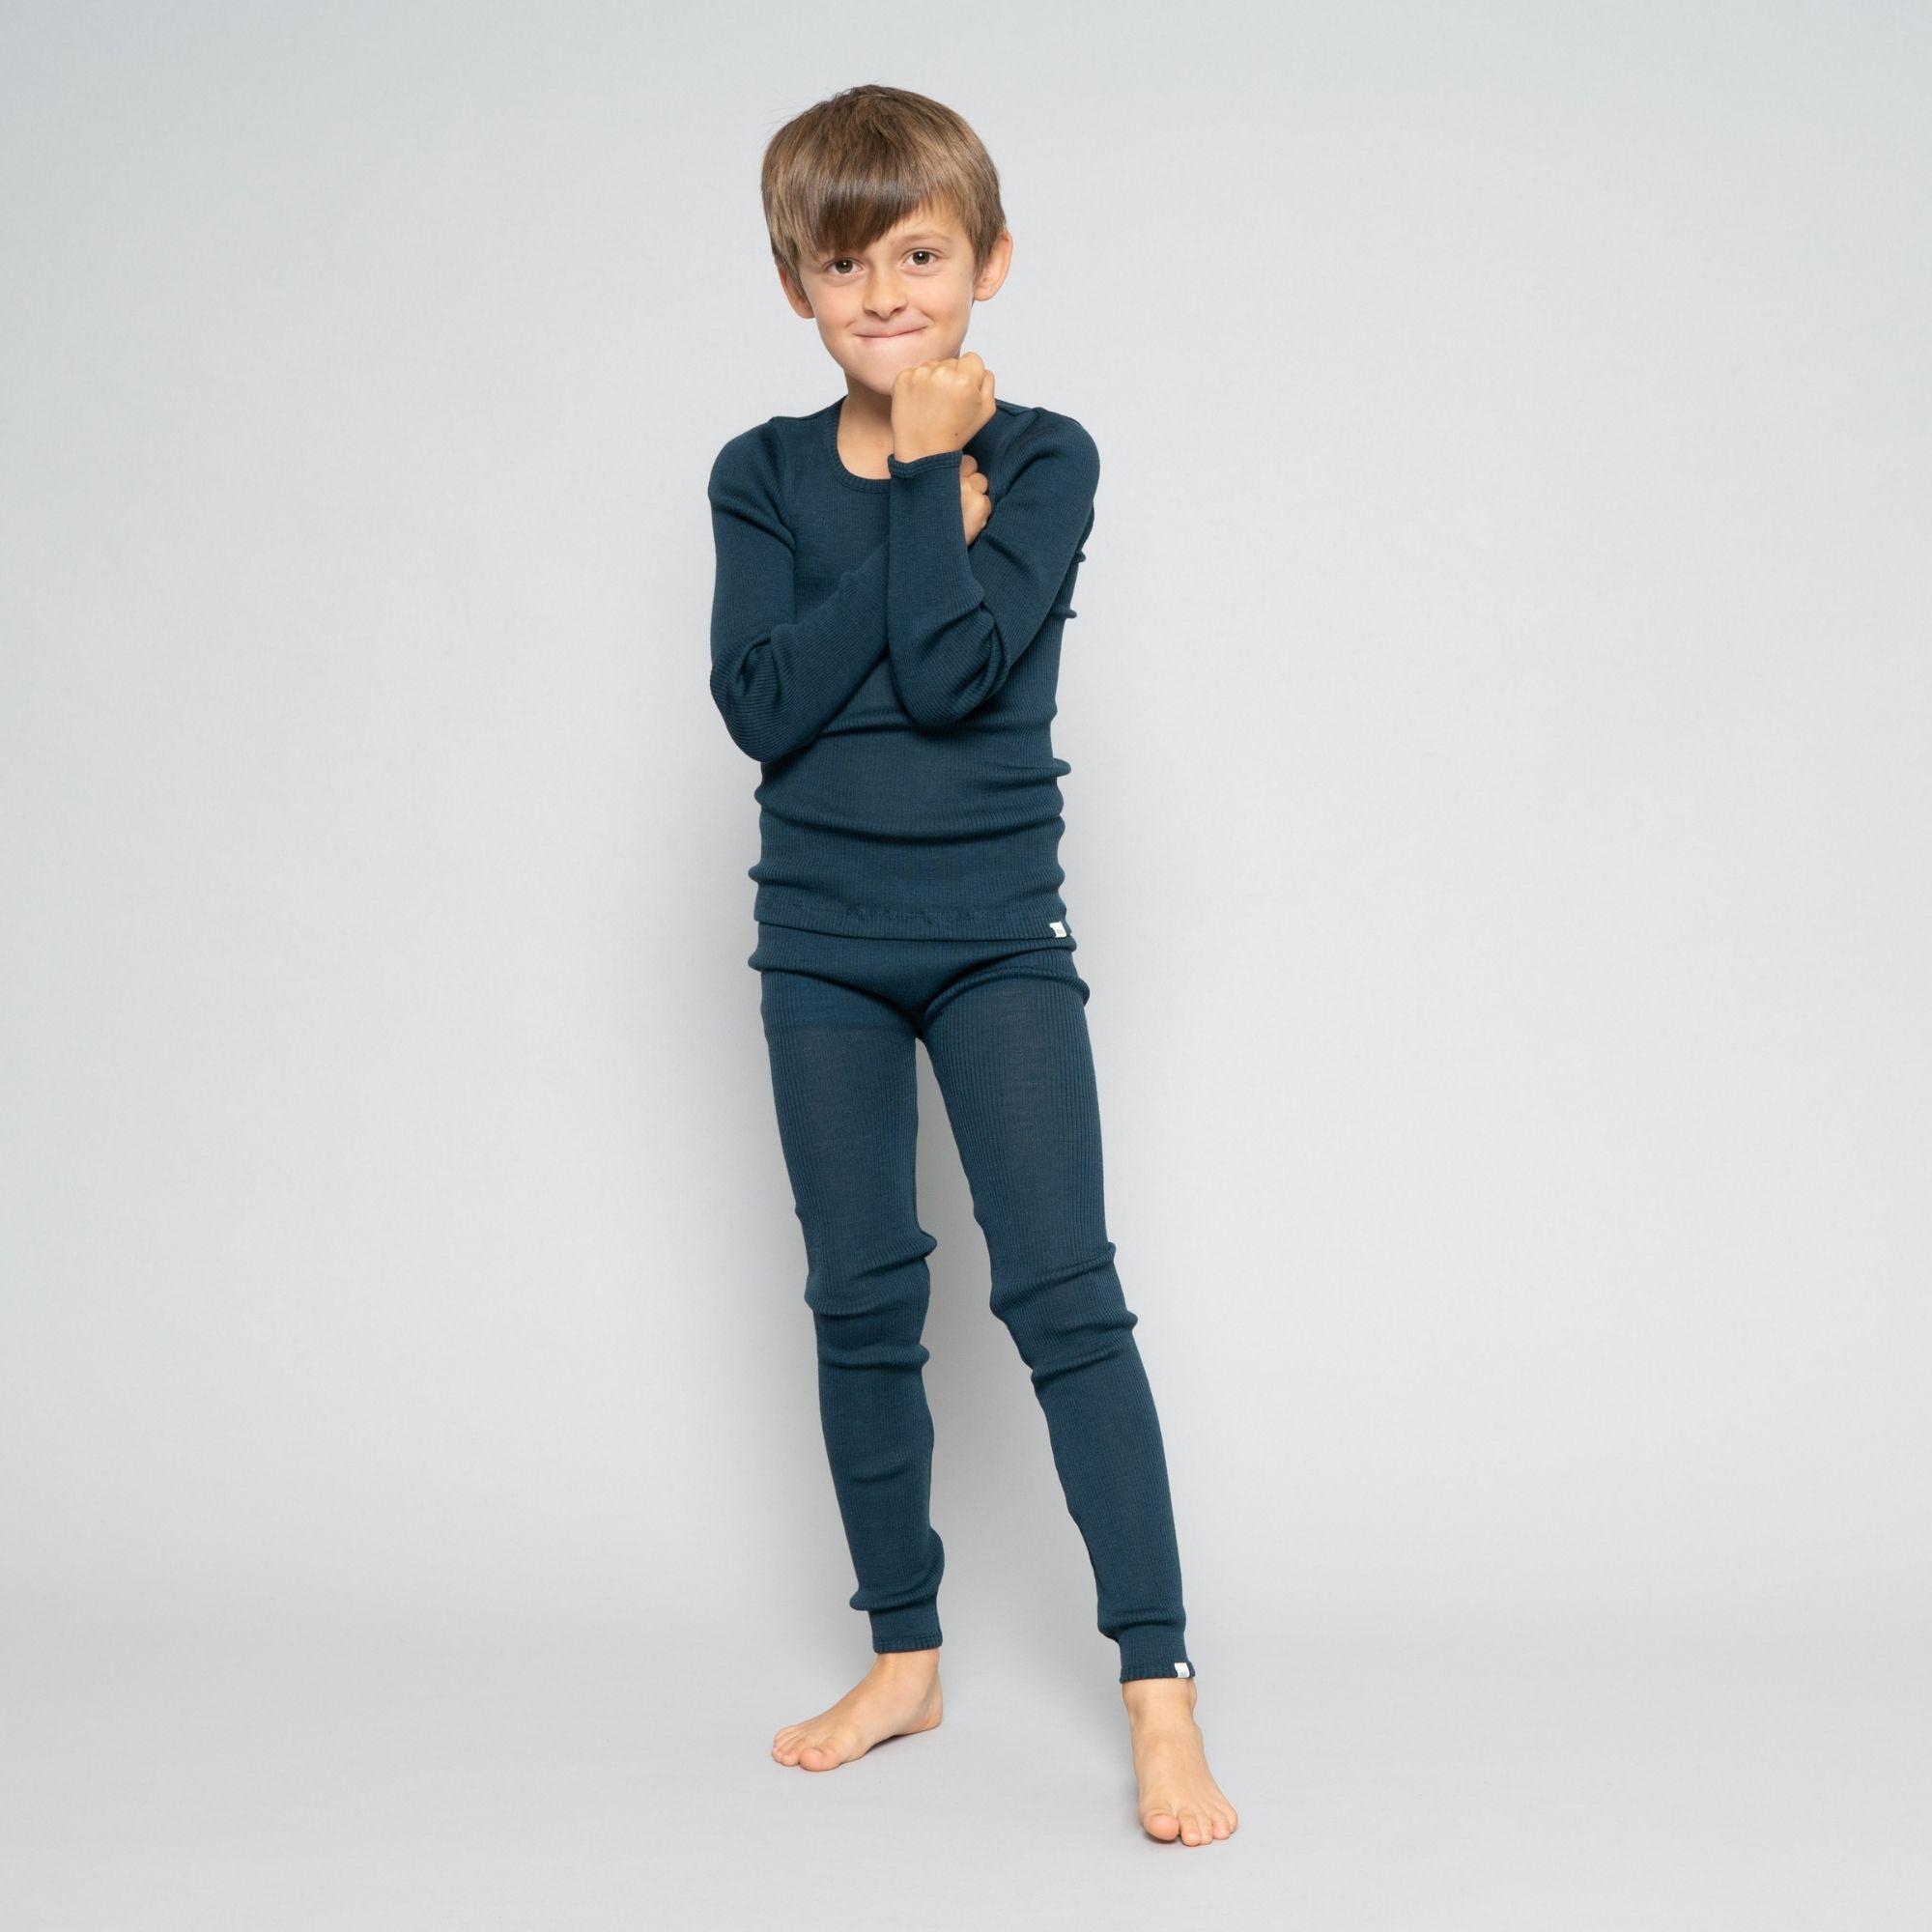 tshirt-manches-longues-enfant-pure-laine-merinos-minimalisma-maison-de-mamoulia-navy-bleu-marine